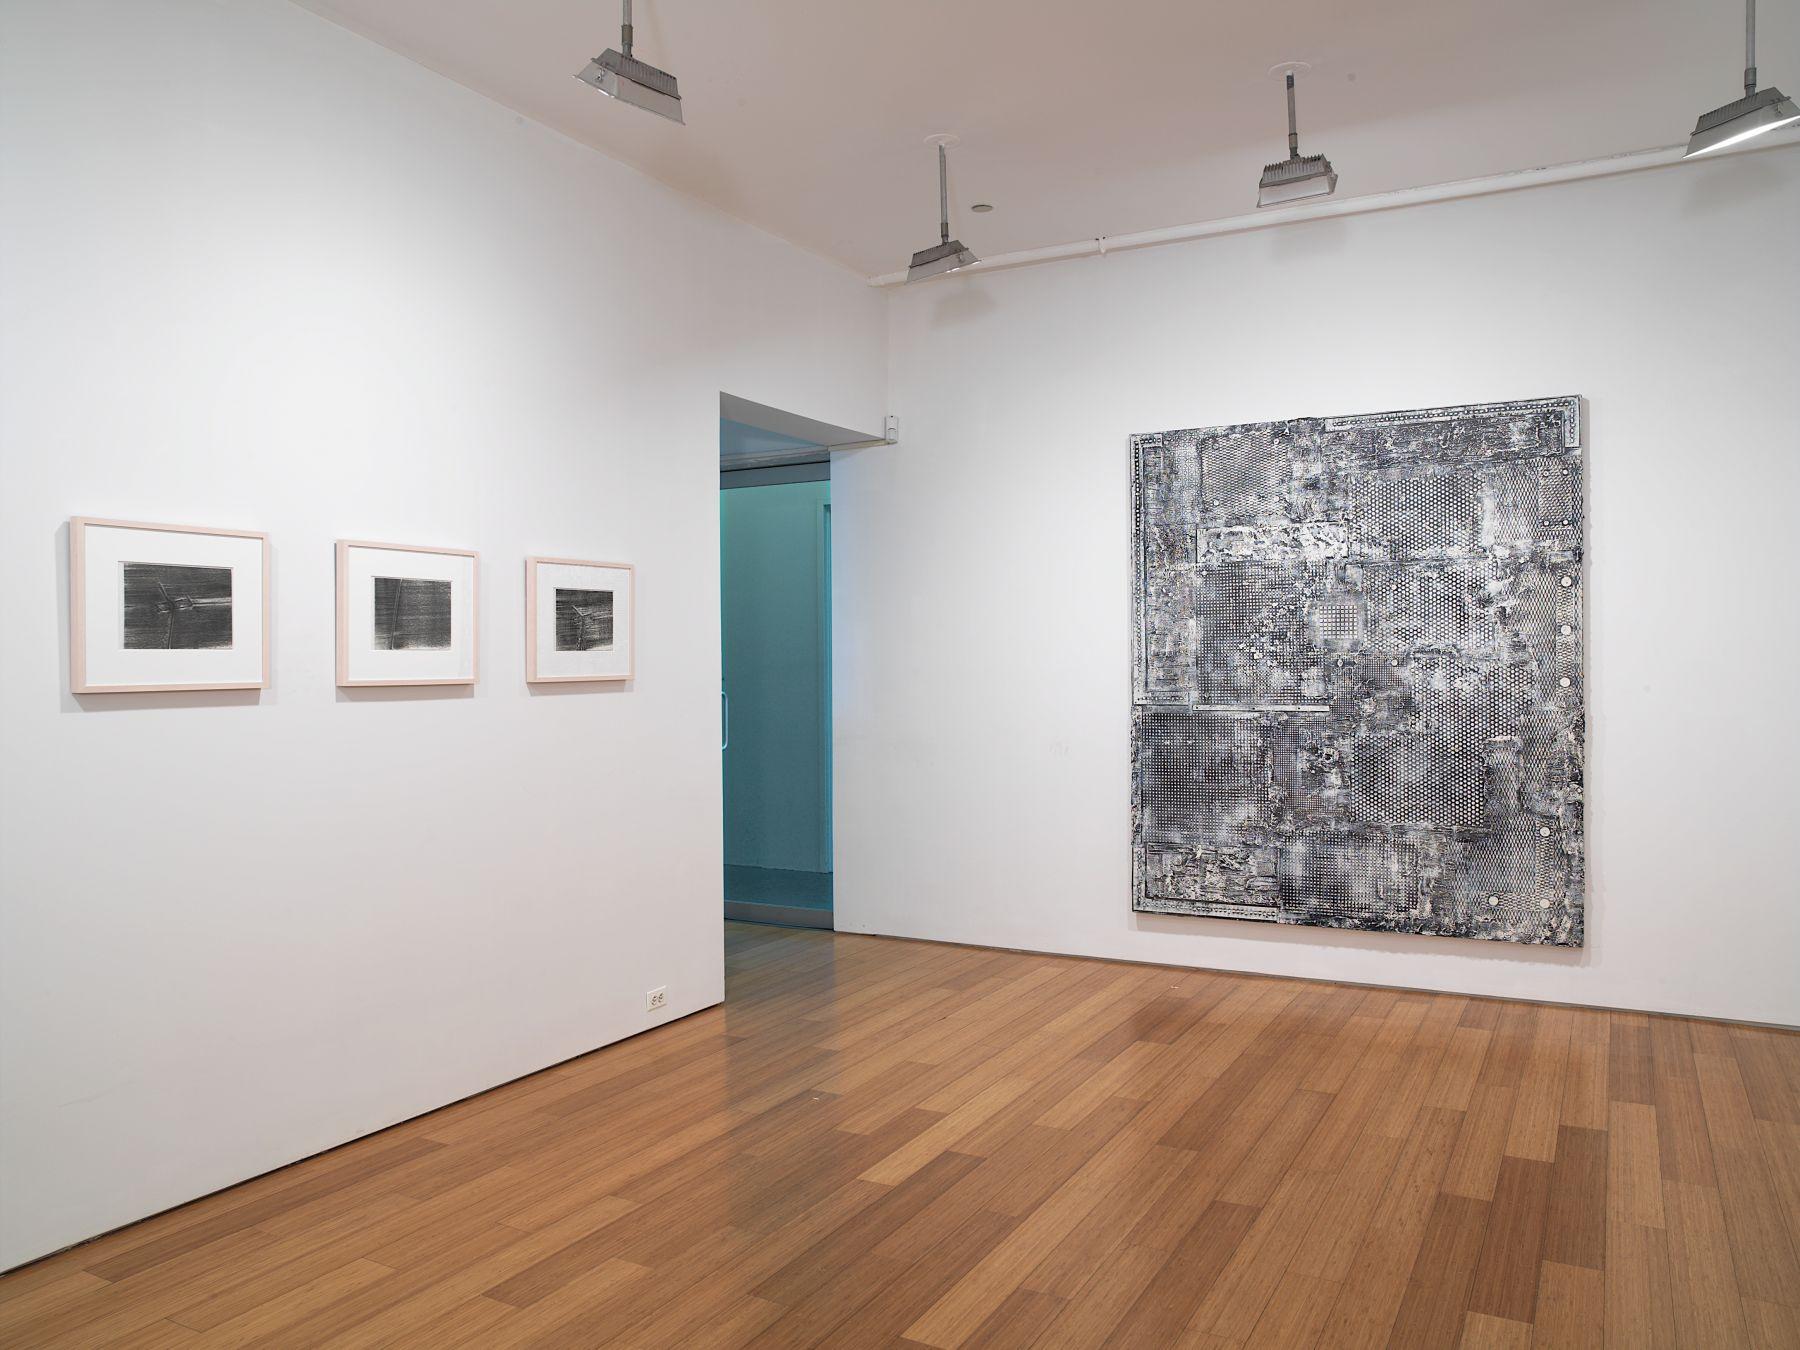 Jack Whitten,Installation view,Alexander Gray Associates, 2007